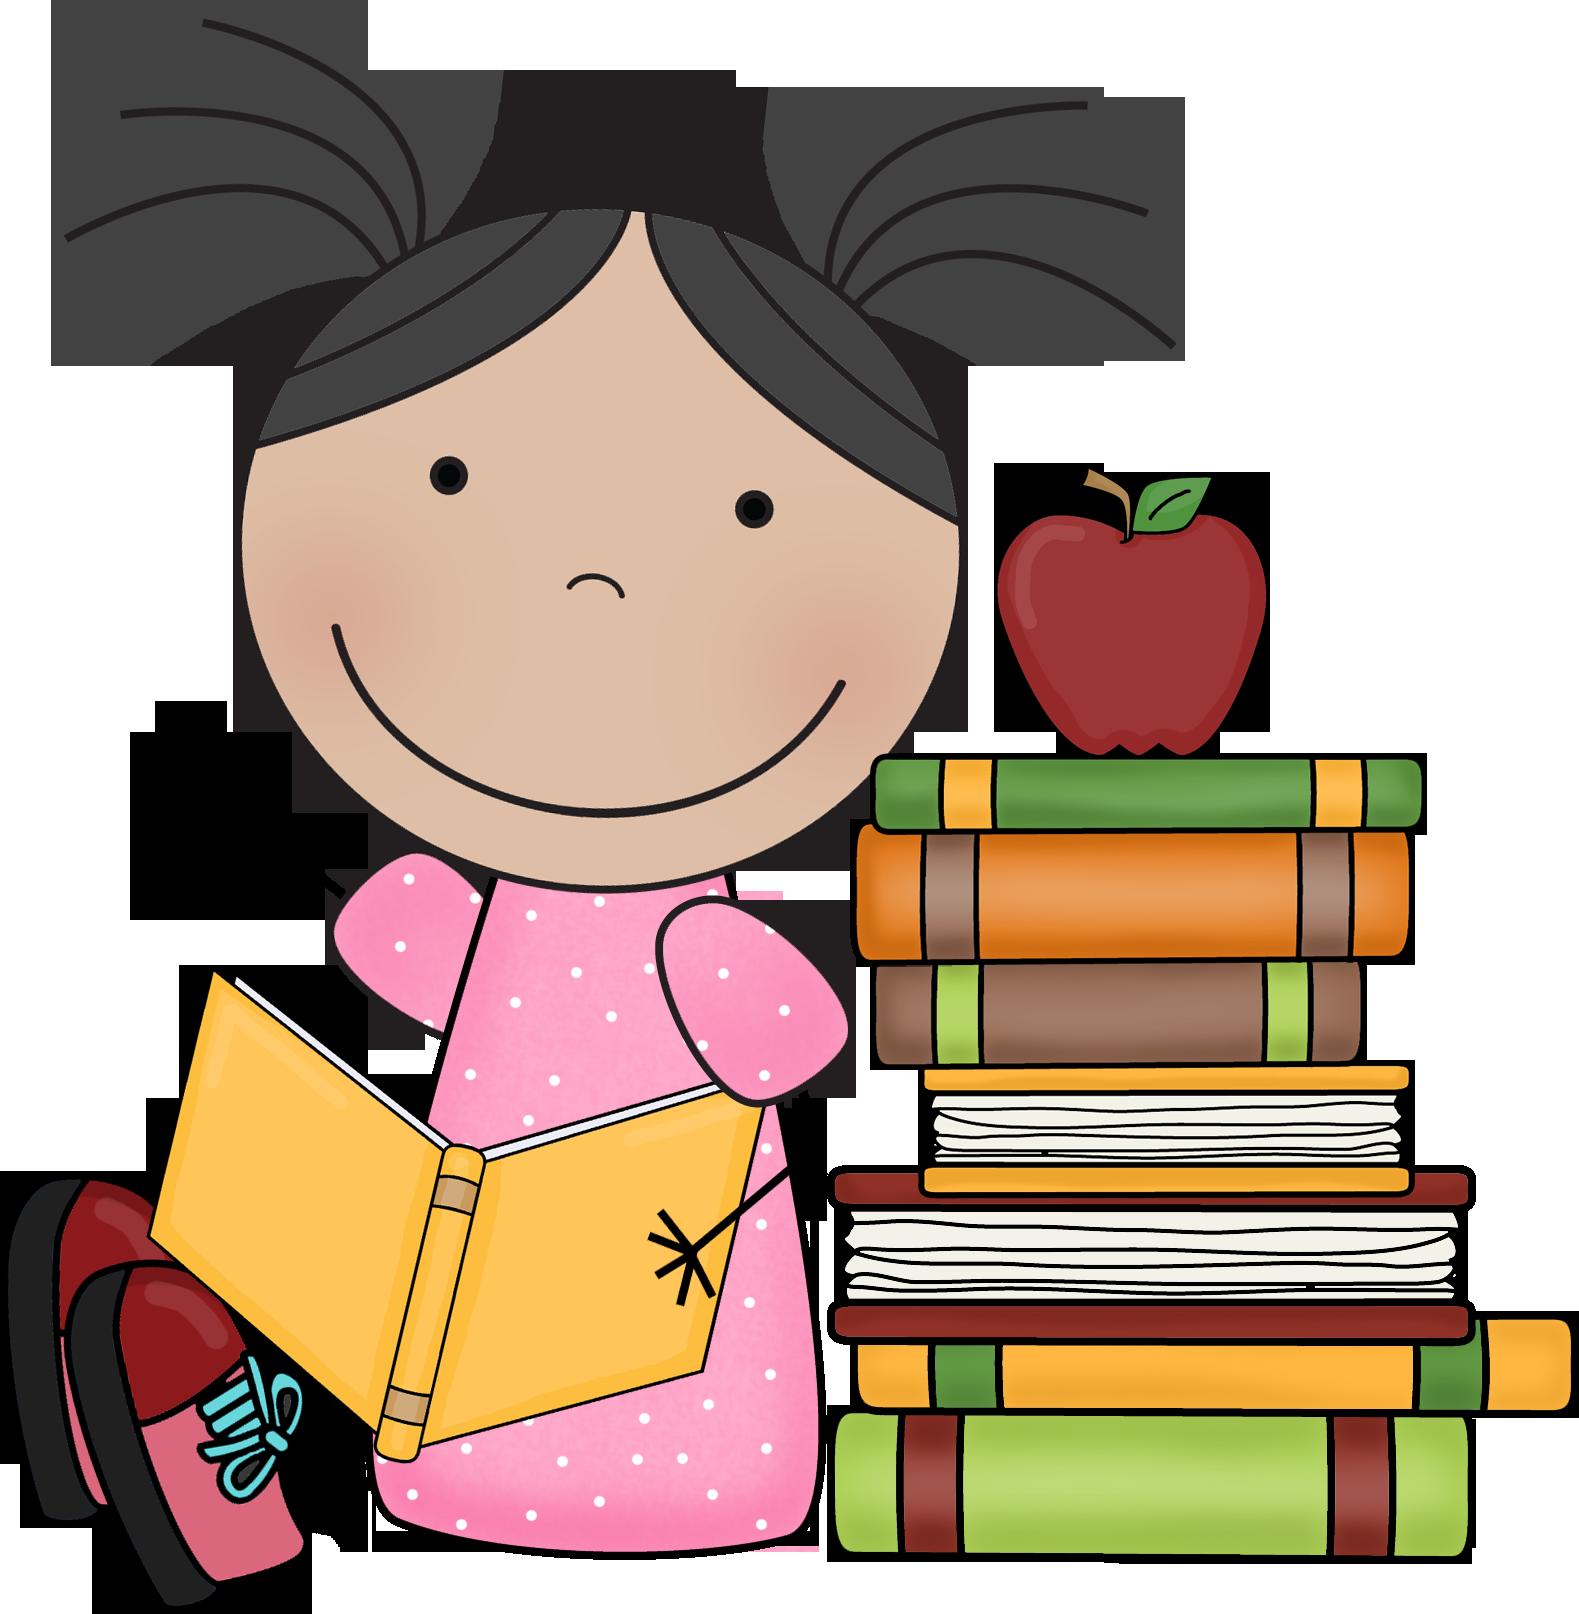 image free download  school stuff pinterest. Stick kids reading clipart